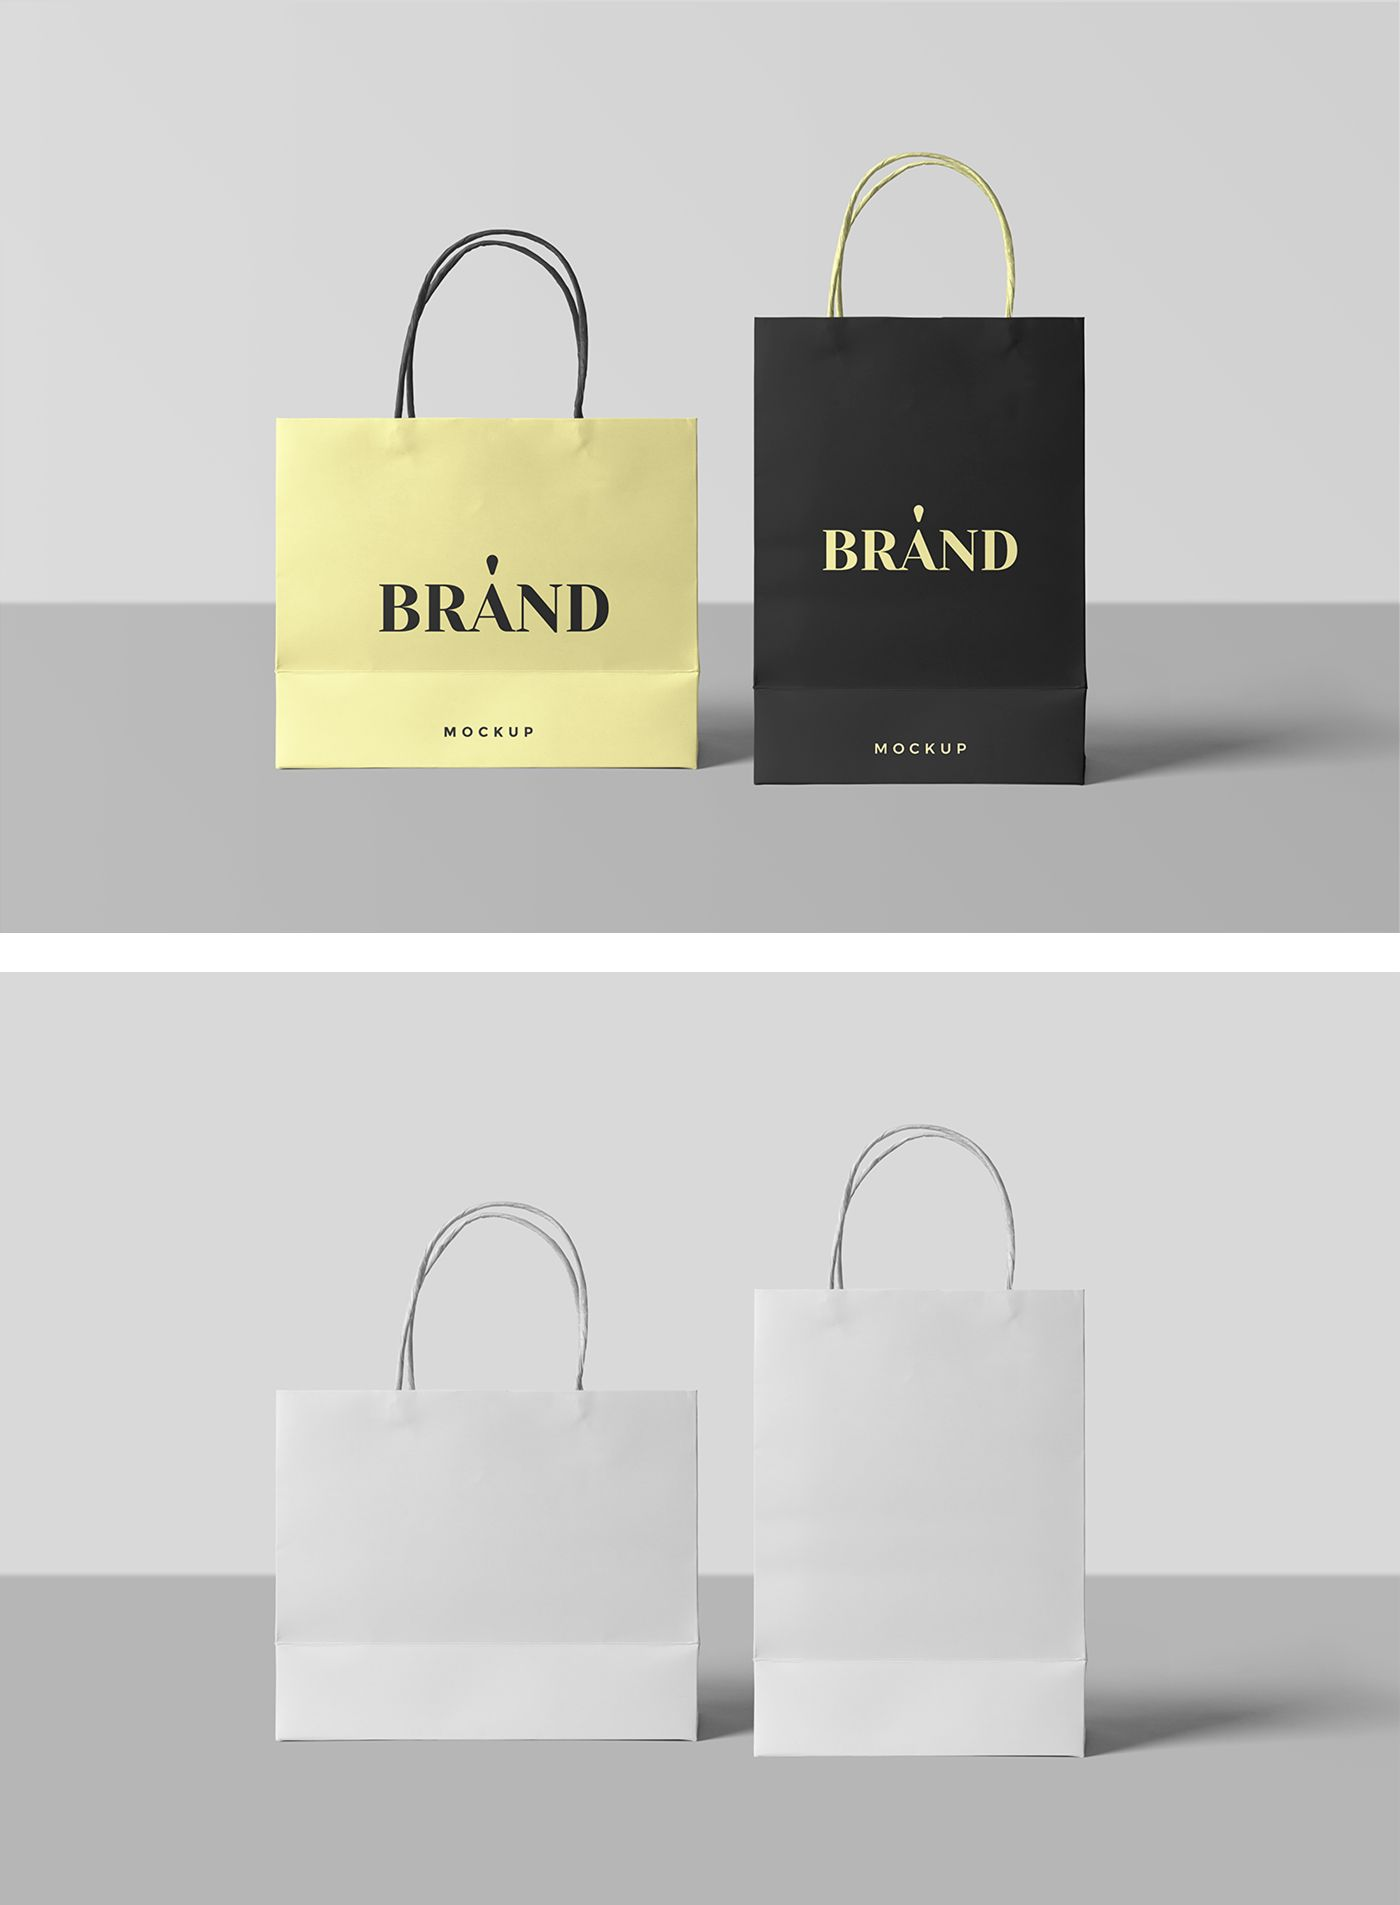 Download Paper Shopping Bags Mockup Mr Mockup Graphic Design Freebies Bag Mockup Free Business Card Mockup Graphic Design Freebies